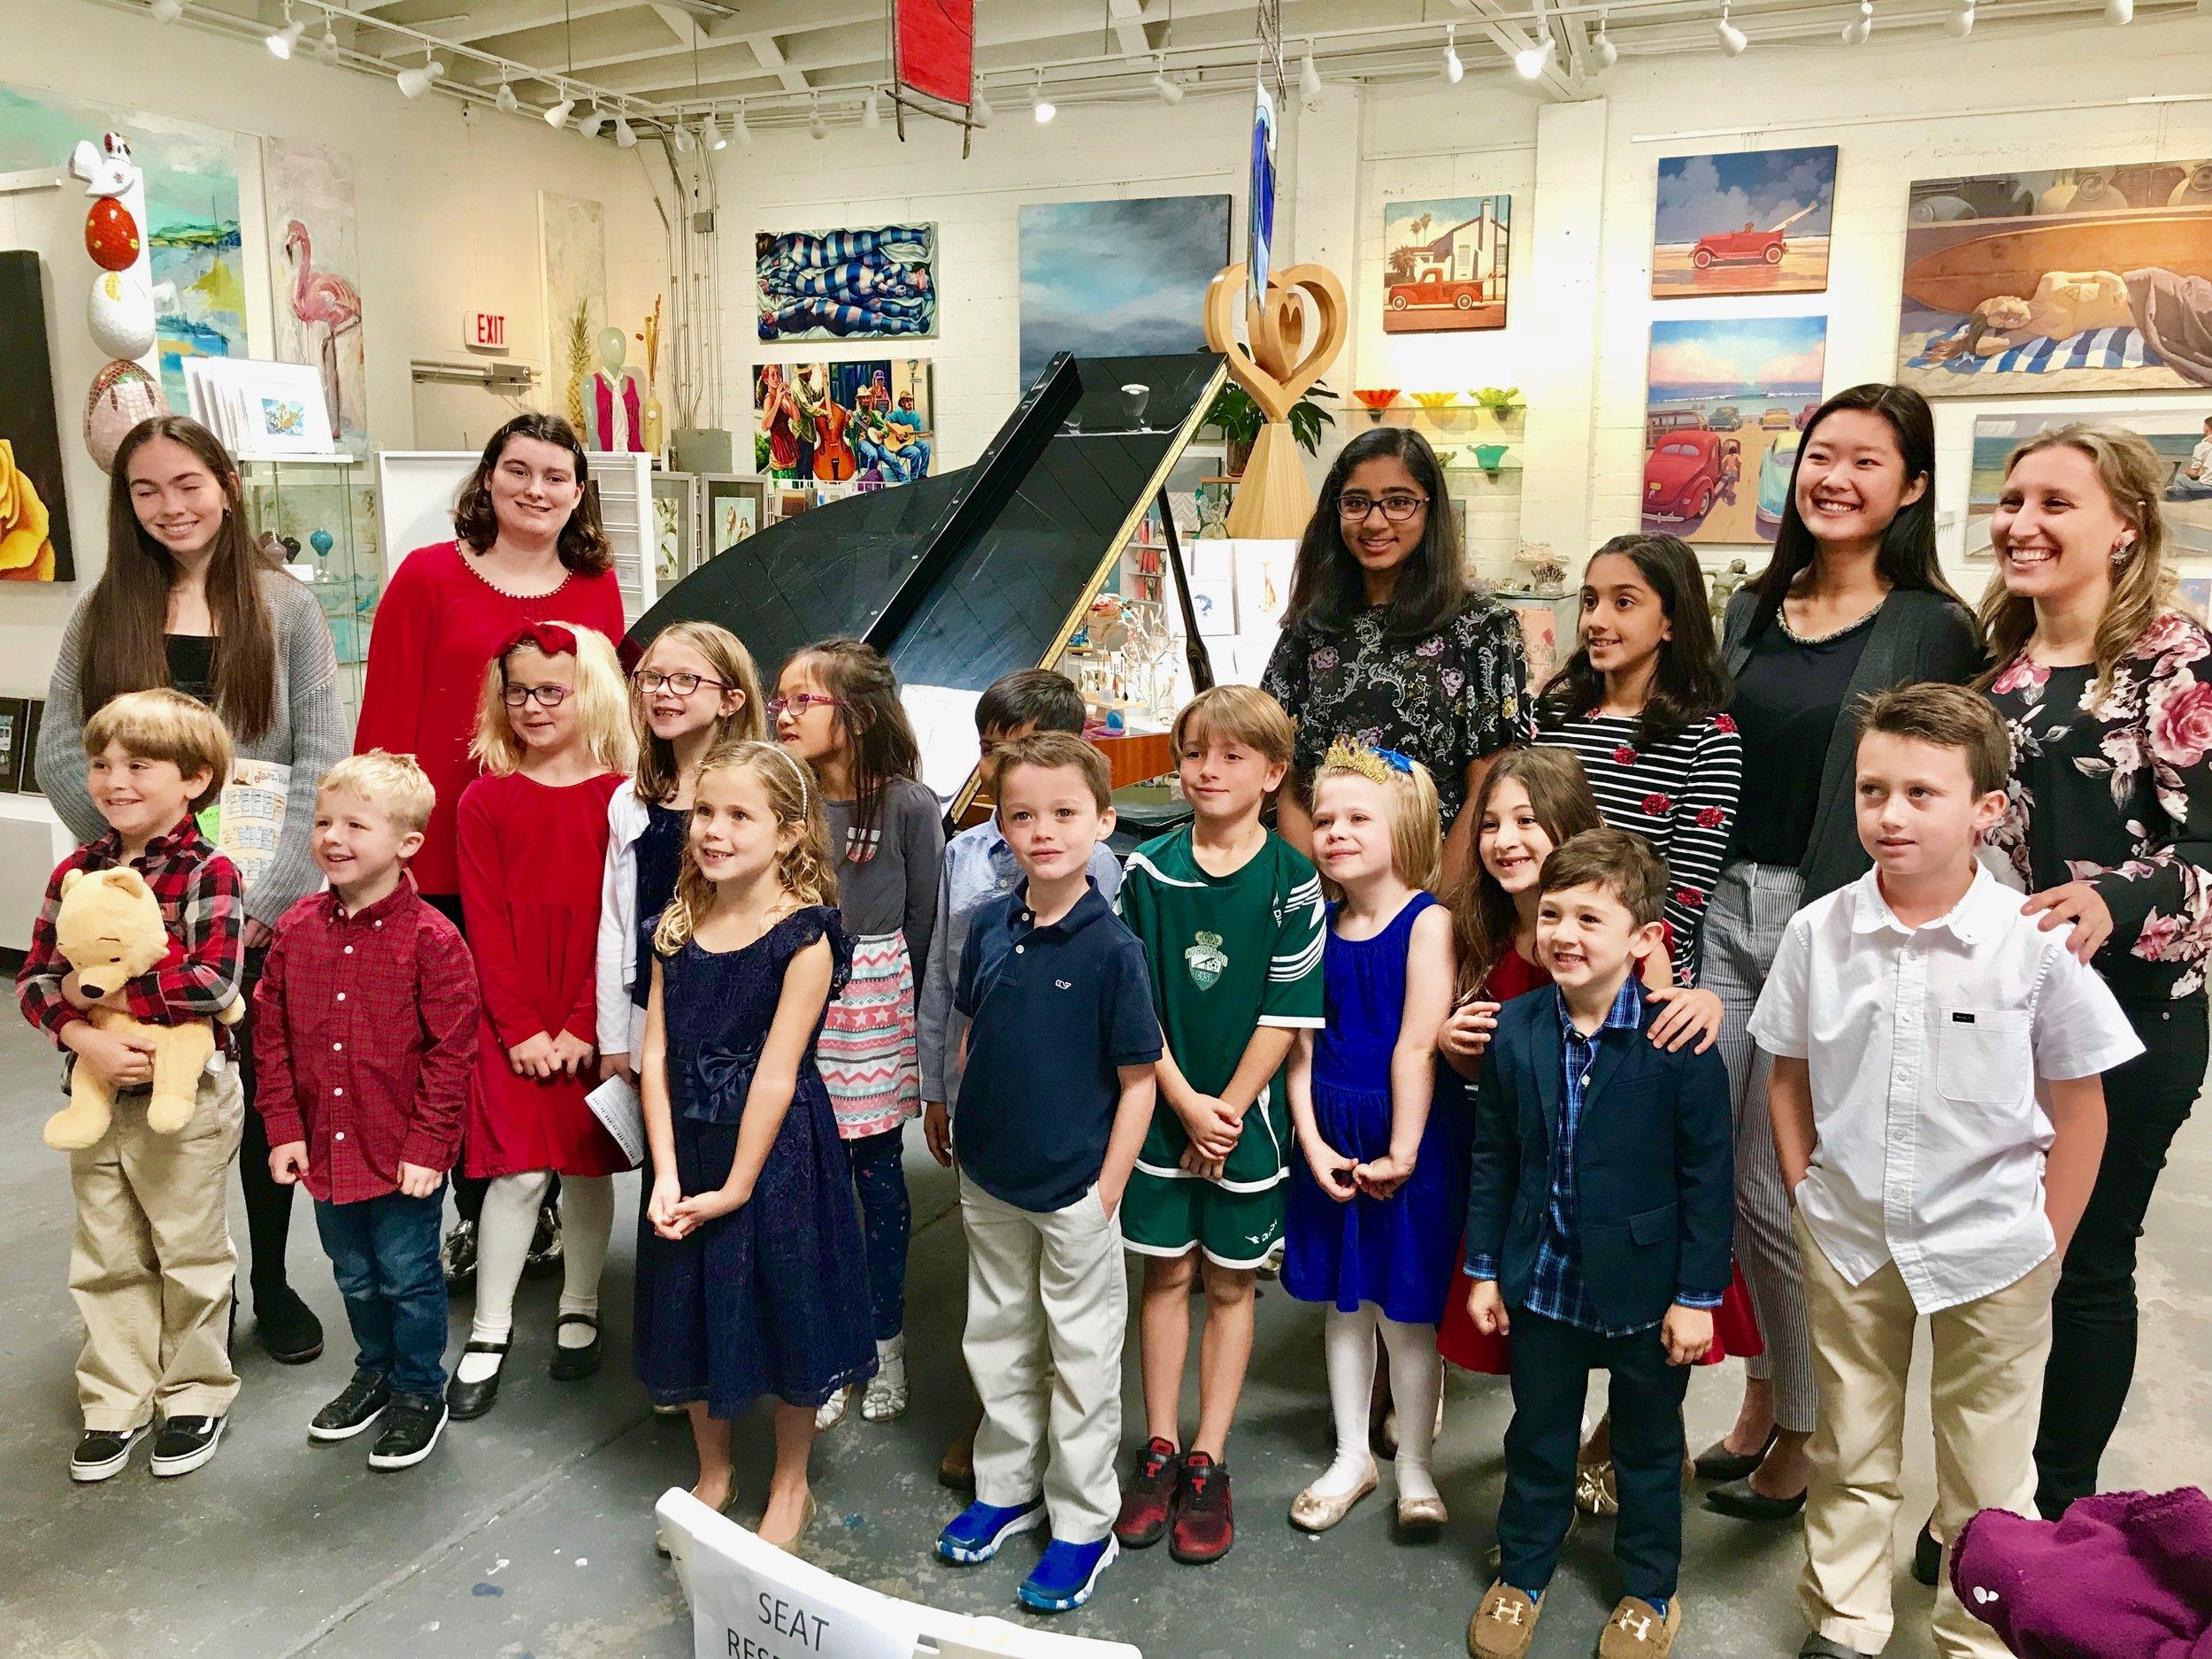 December 2018 (Group A) at Emerald C Gallery in Coronado